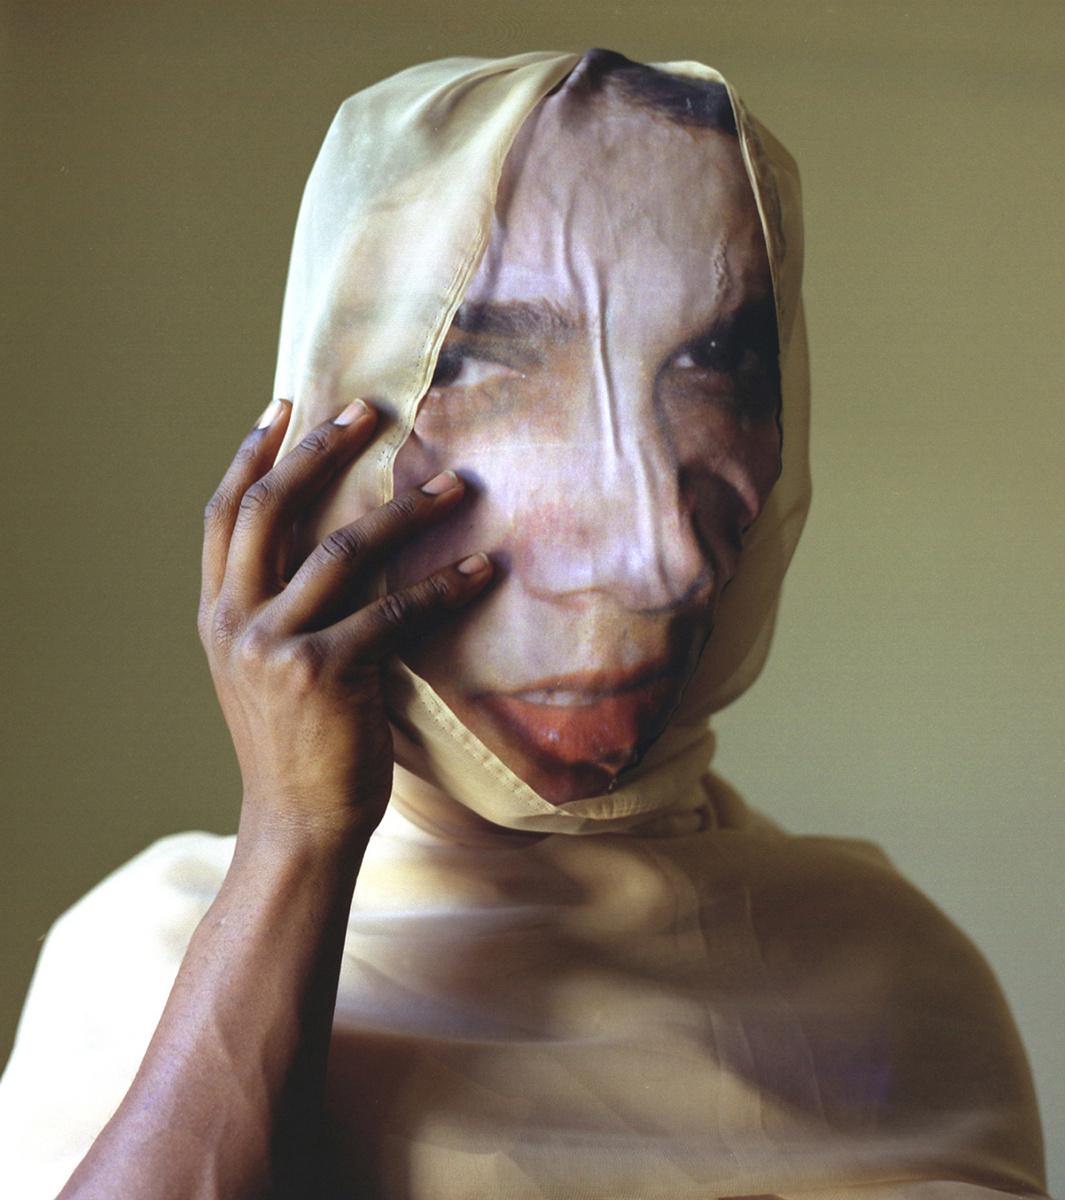 Onnagata (2003)